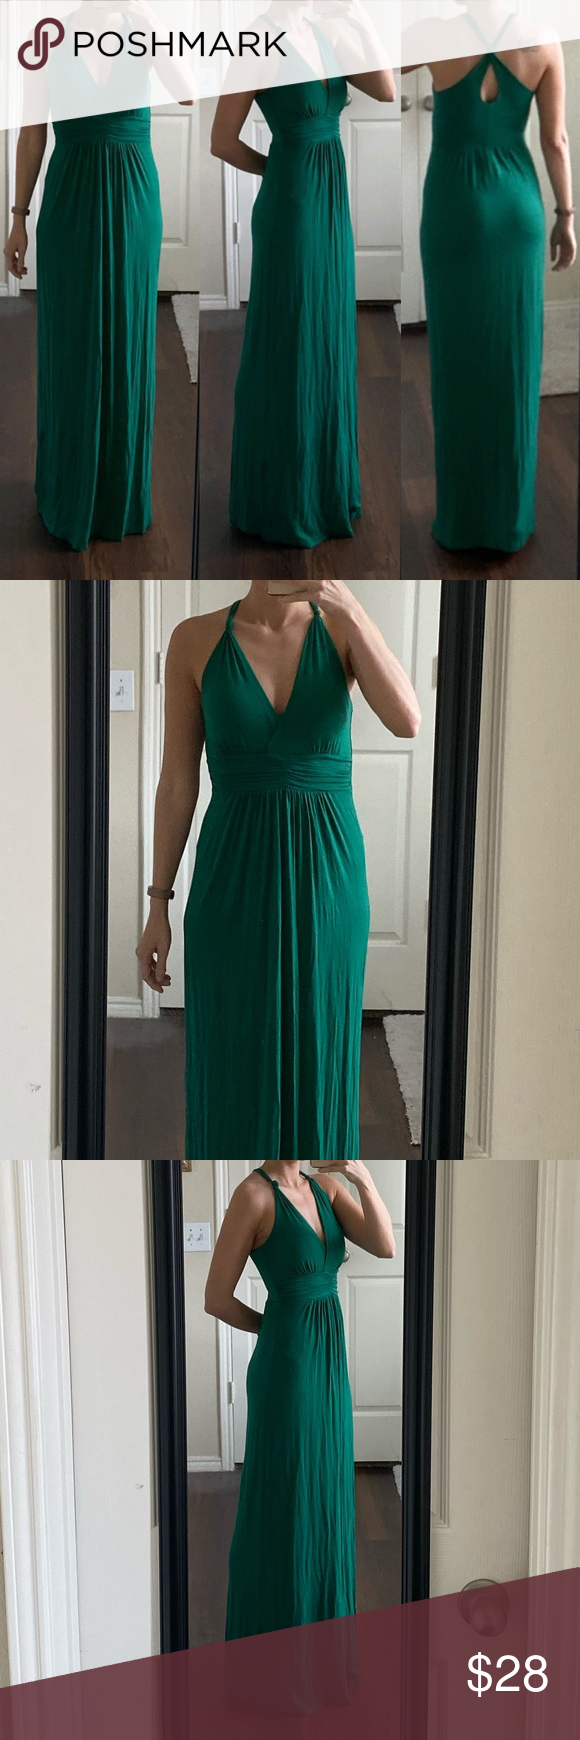 Gilli Emerald Kelly Green Stretchy Maxi Dress Dresses Fashion Clothes Design [ 1740 x 580 Pixel ]